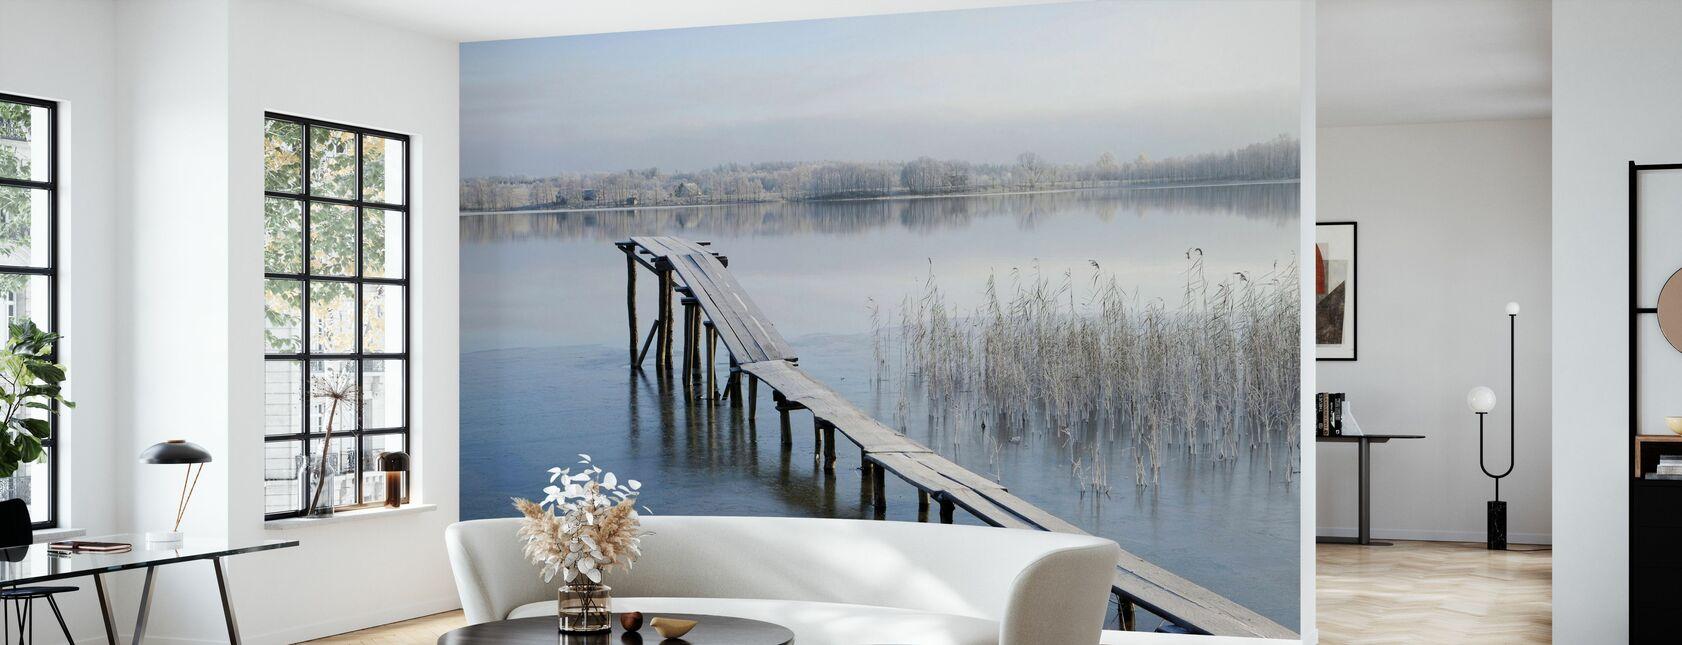 Attributes of Winter - Wallpaper - Living Room